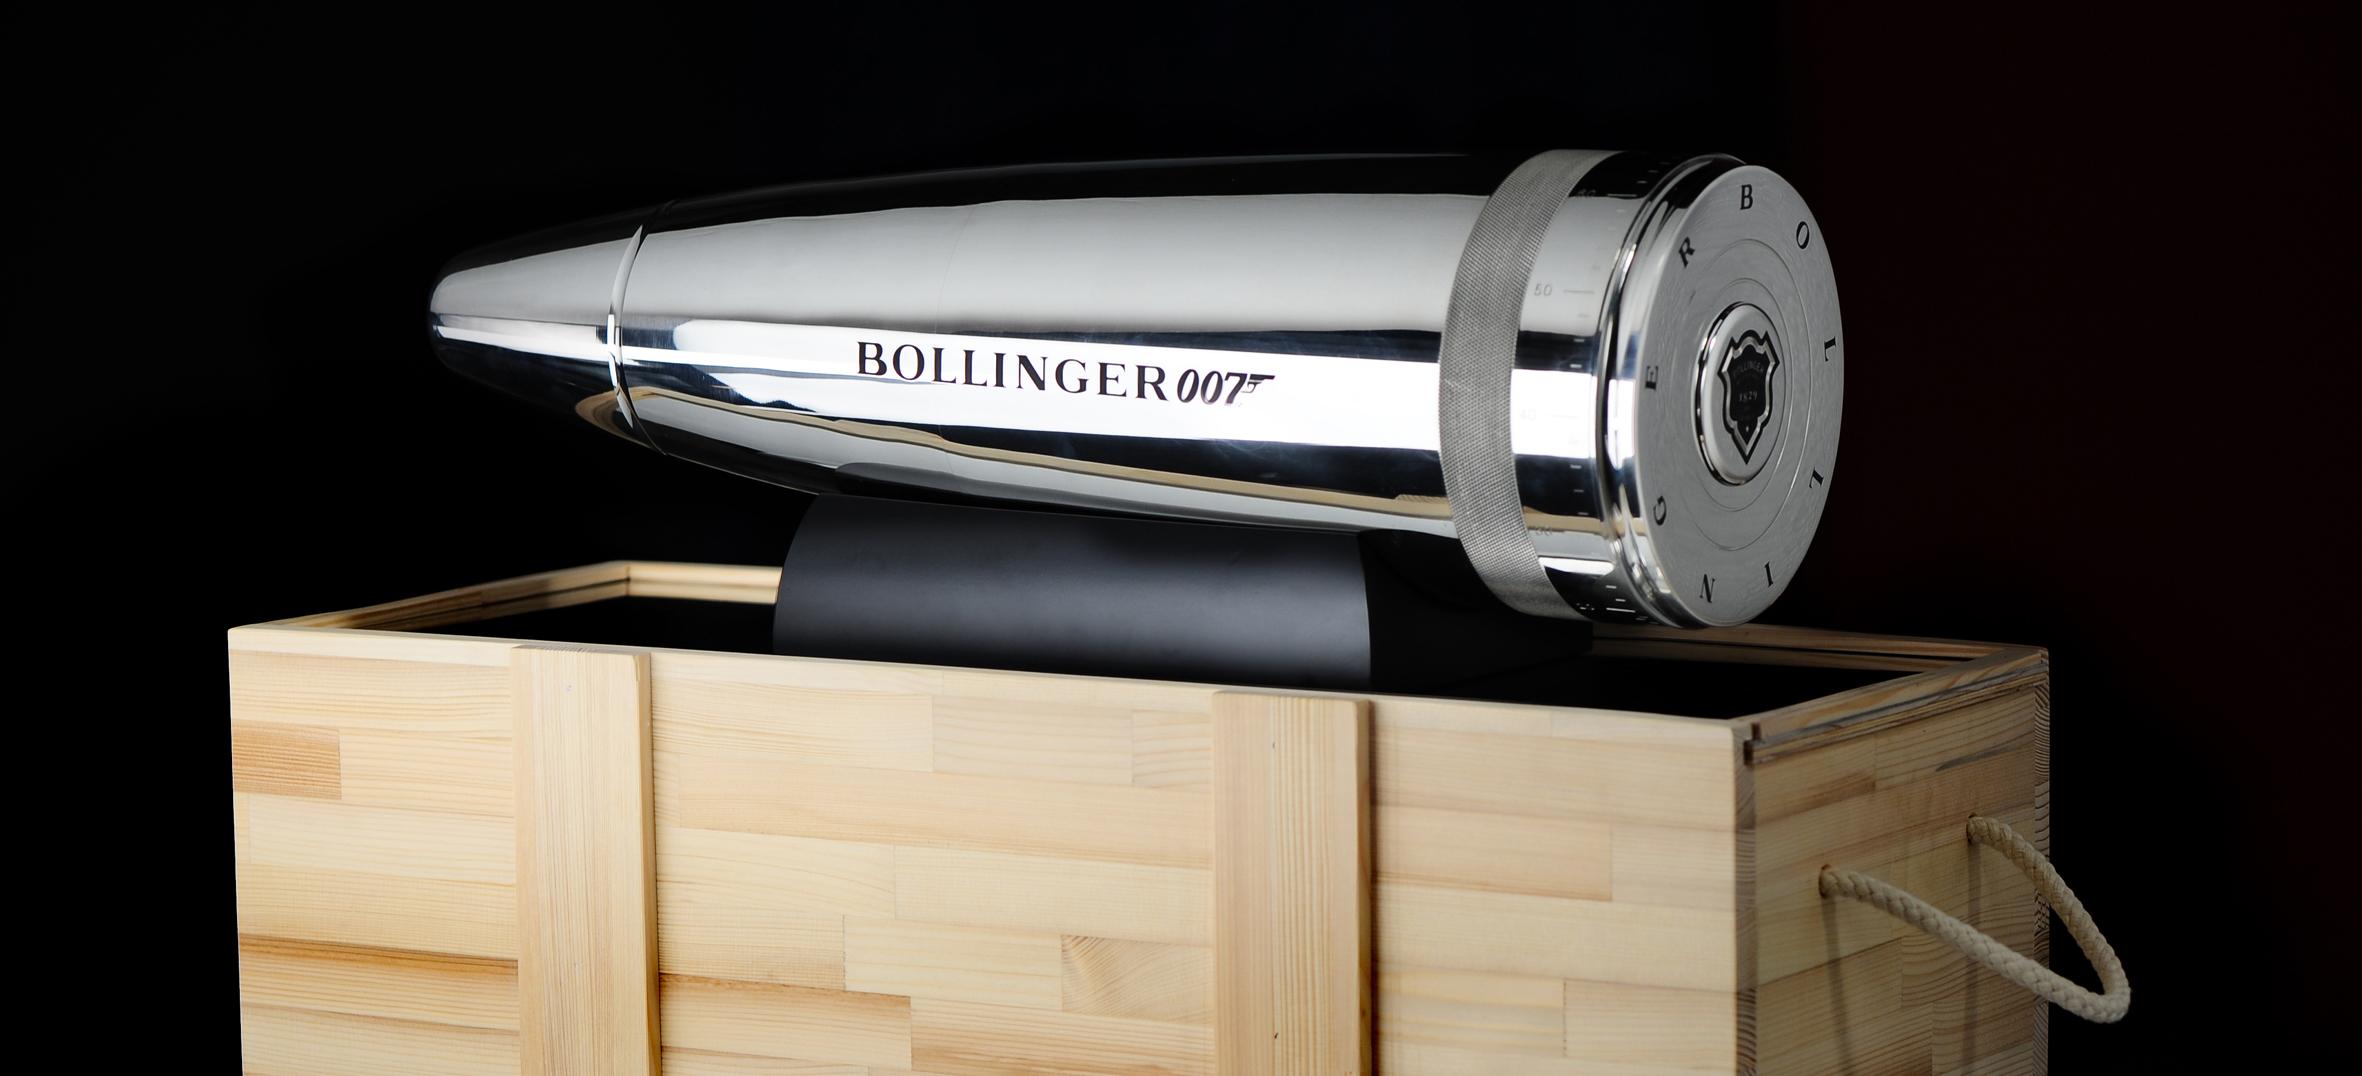 BOLLINGER_Bullet-007_DESIGN-PRODUIT_Spiritueux-Champagne-James-BondPLANET-DESIGN-PARIS-Eric-Berthes_03.jpg